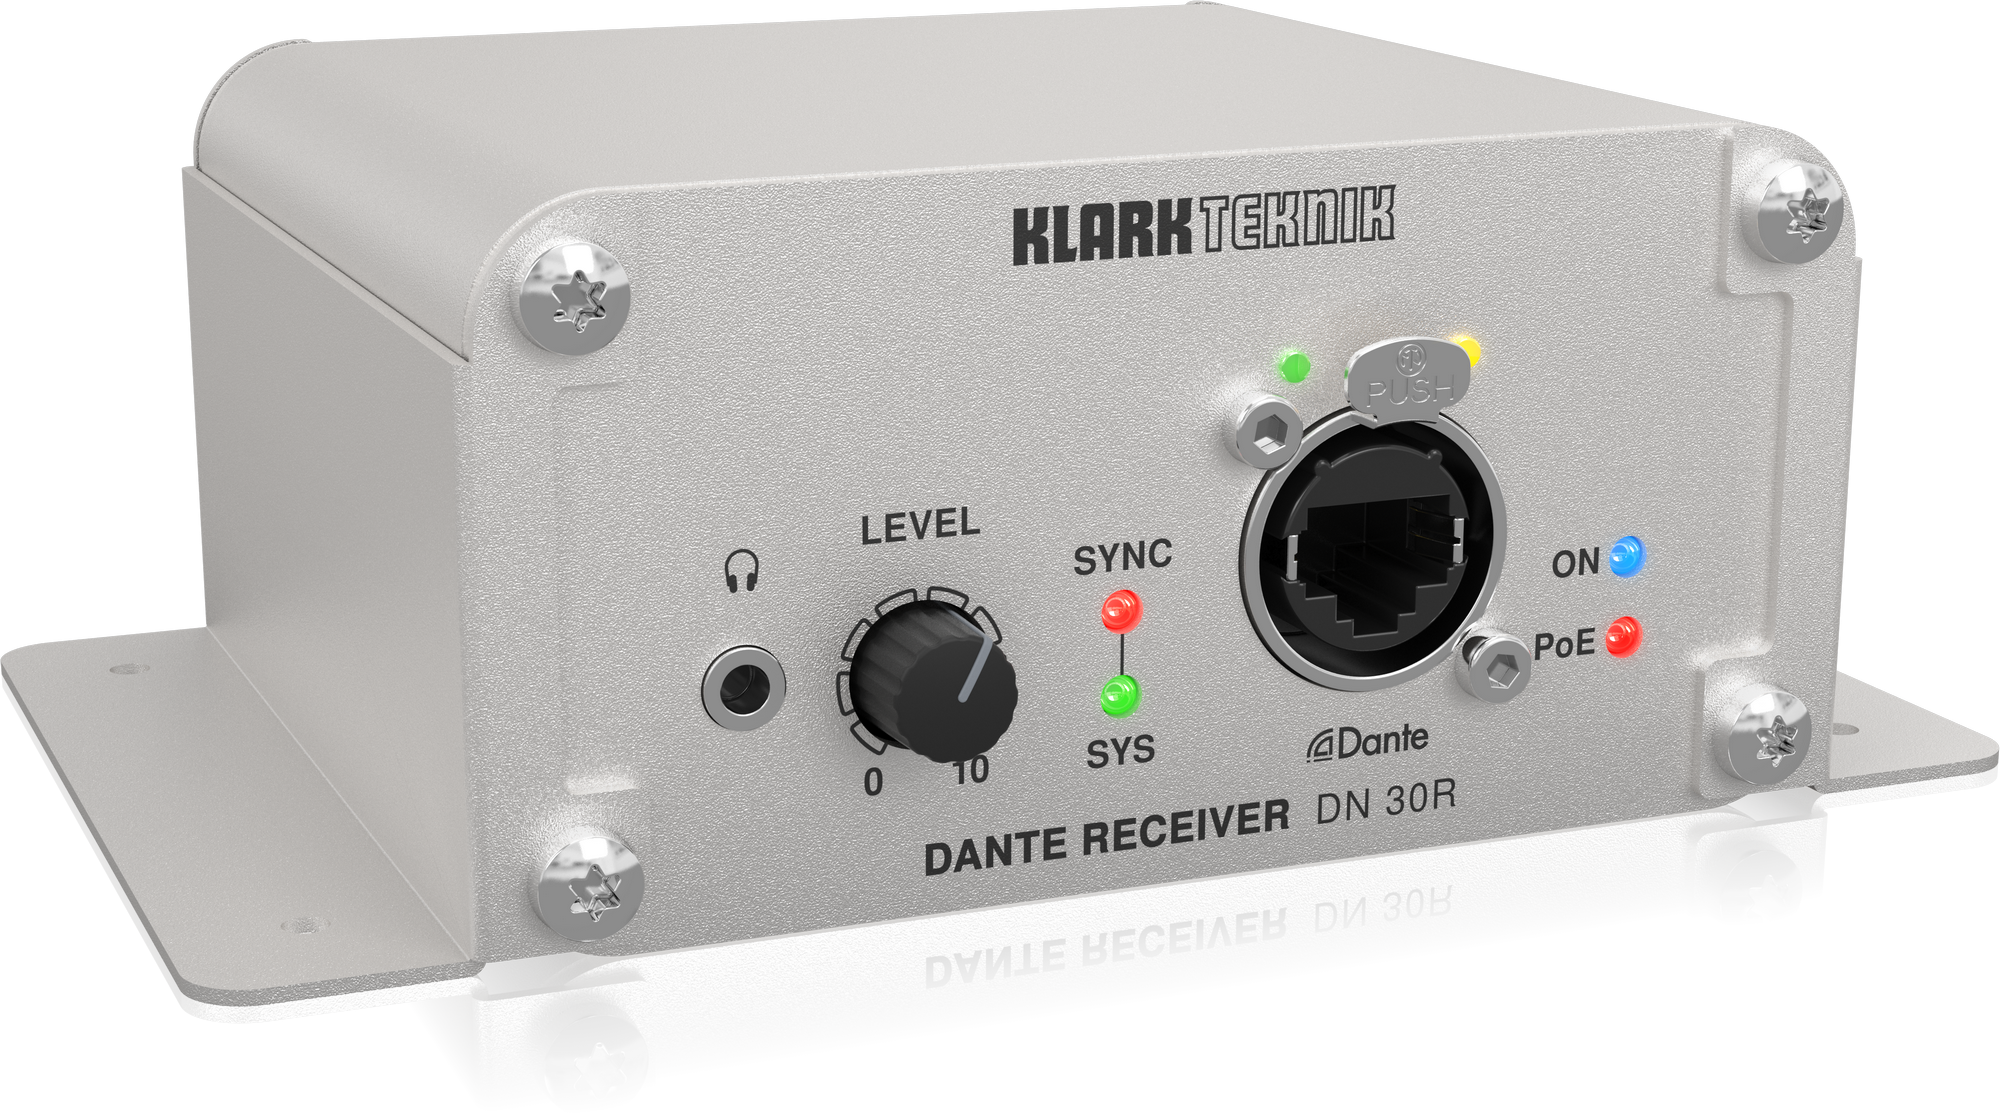 Klark Teknik DN 30R - Dante Receiver